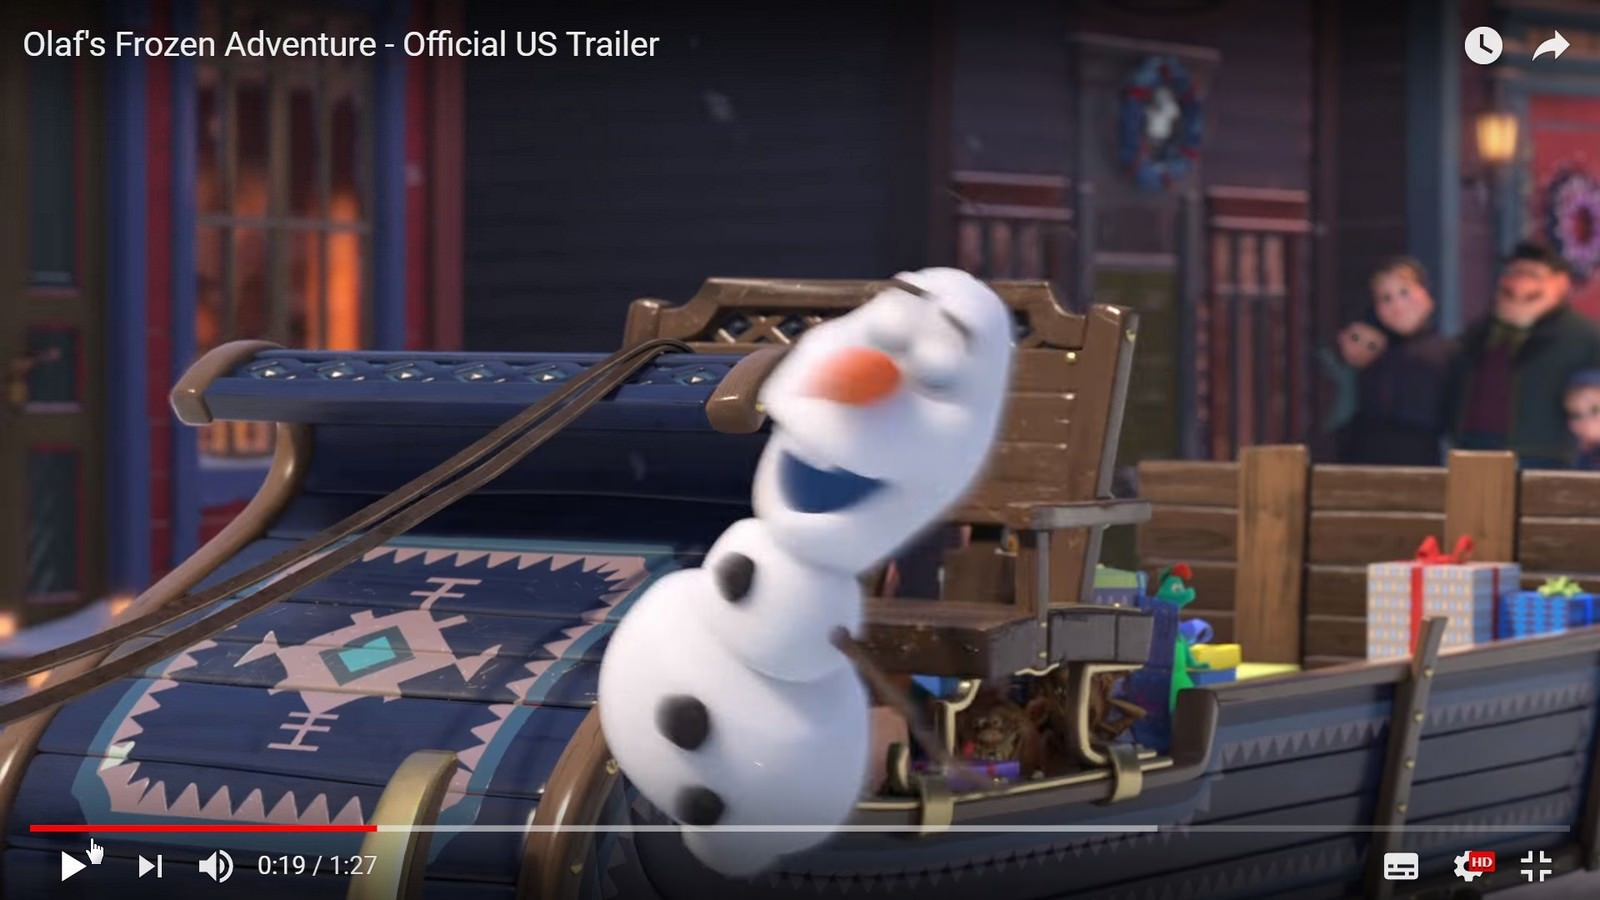 Movie, Olaf's Frozen Adventure(美國, 2017年) / 雪寶的佳節冒險(台灣), 電影劇照, 彩蛋整理分析